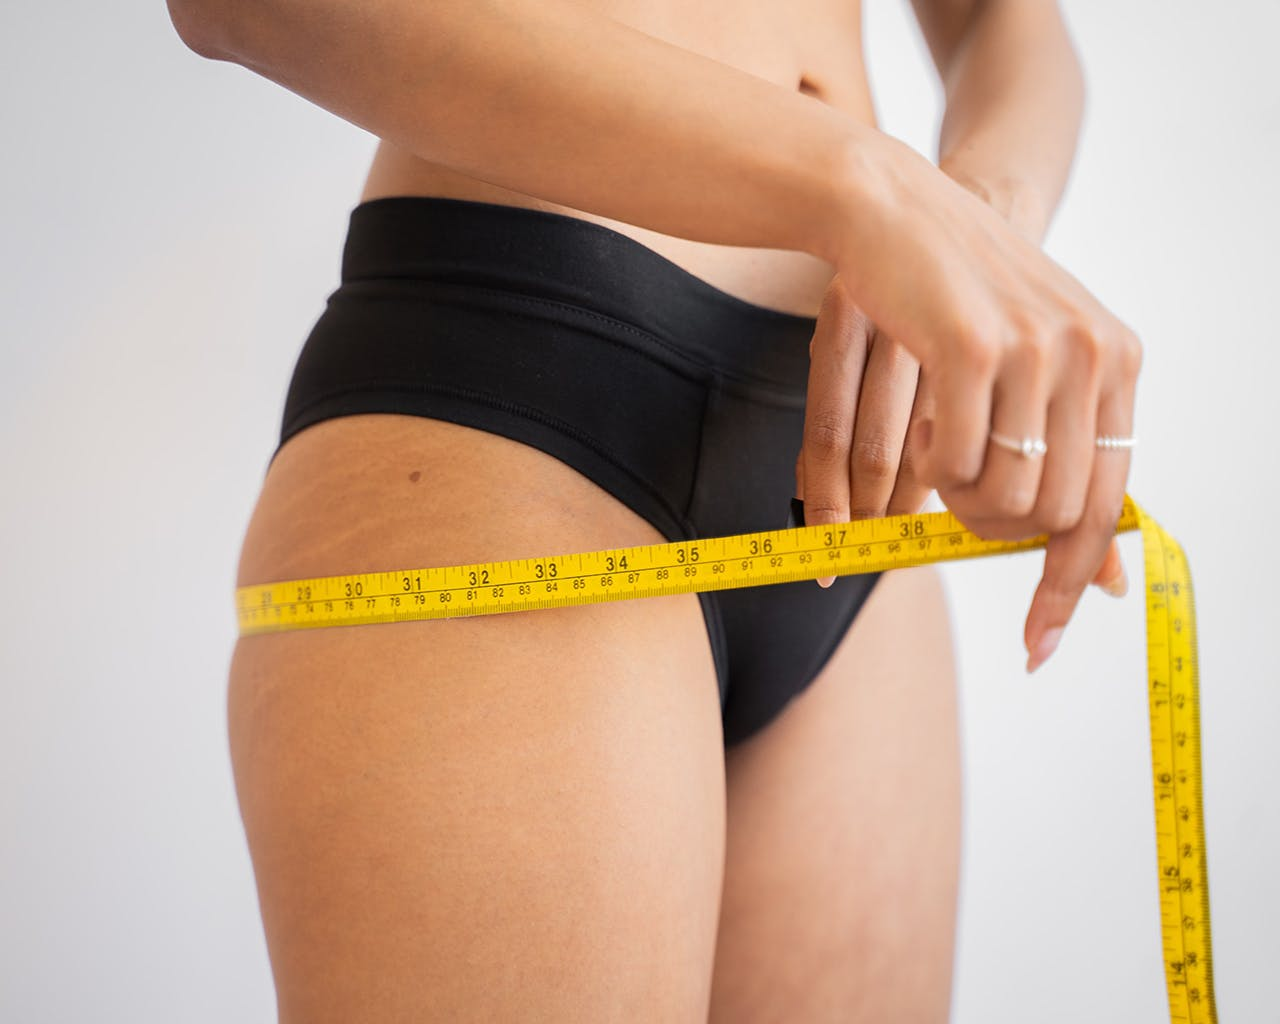 Body Positivity Is Not About Feeling Beautiful 24/7